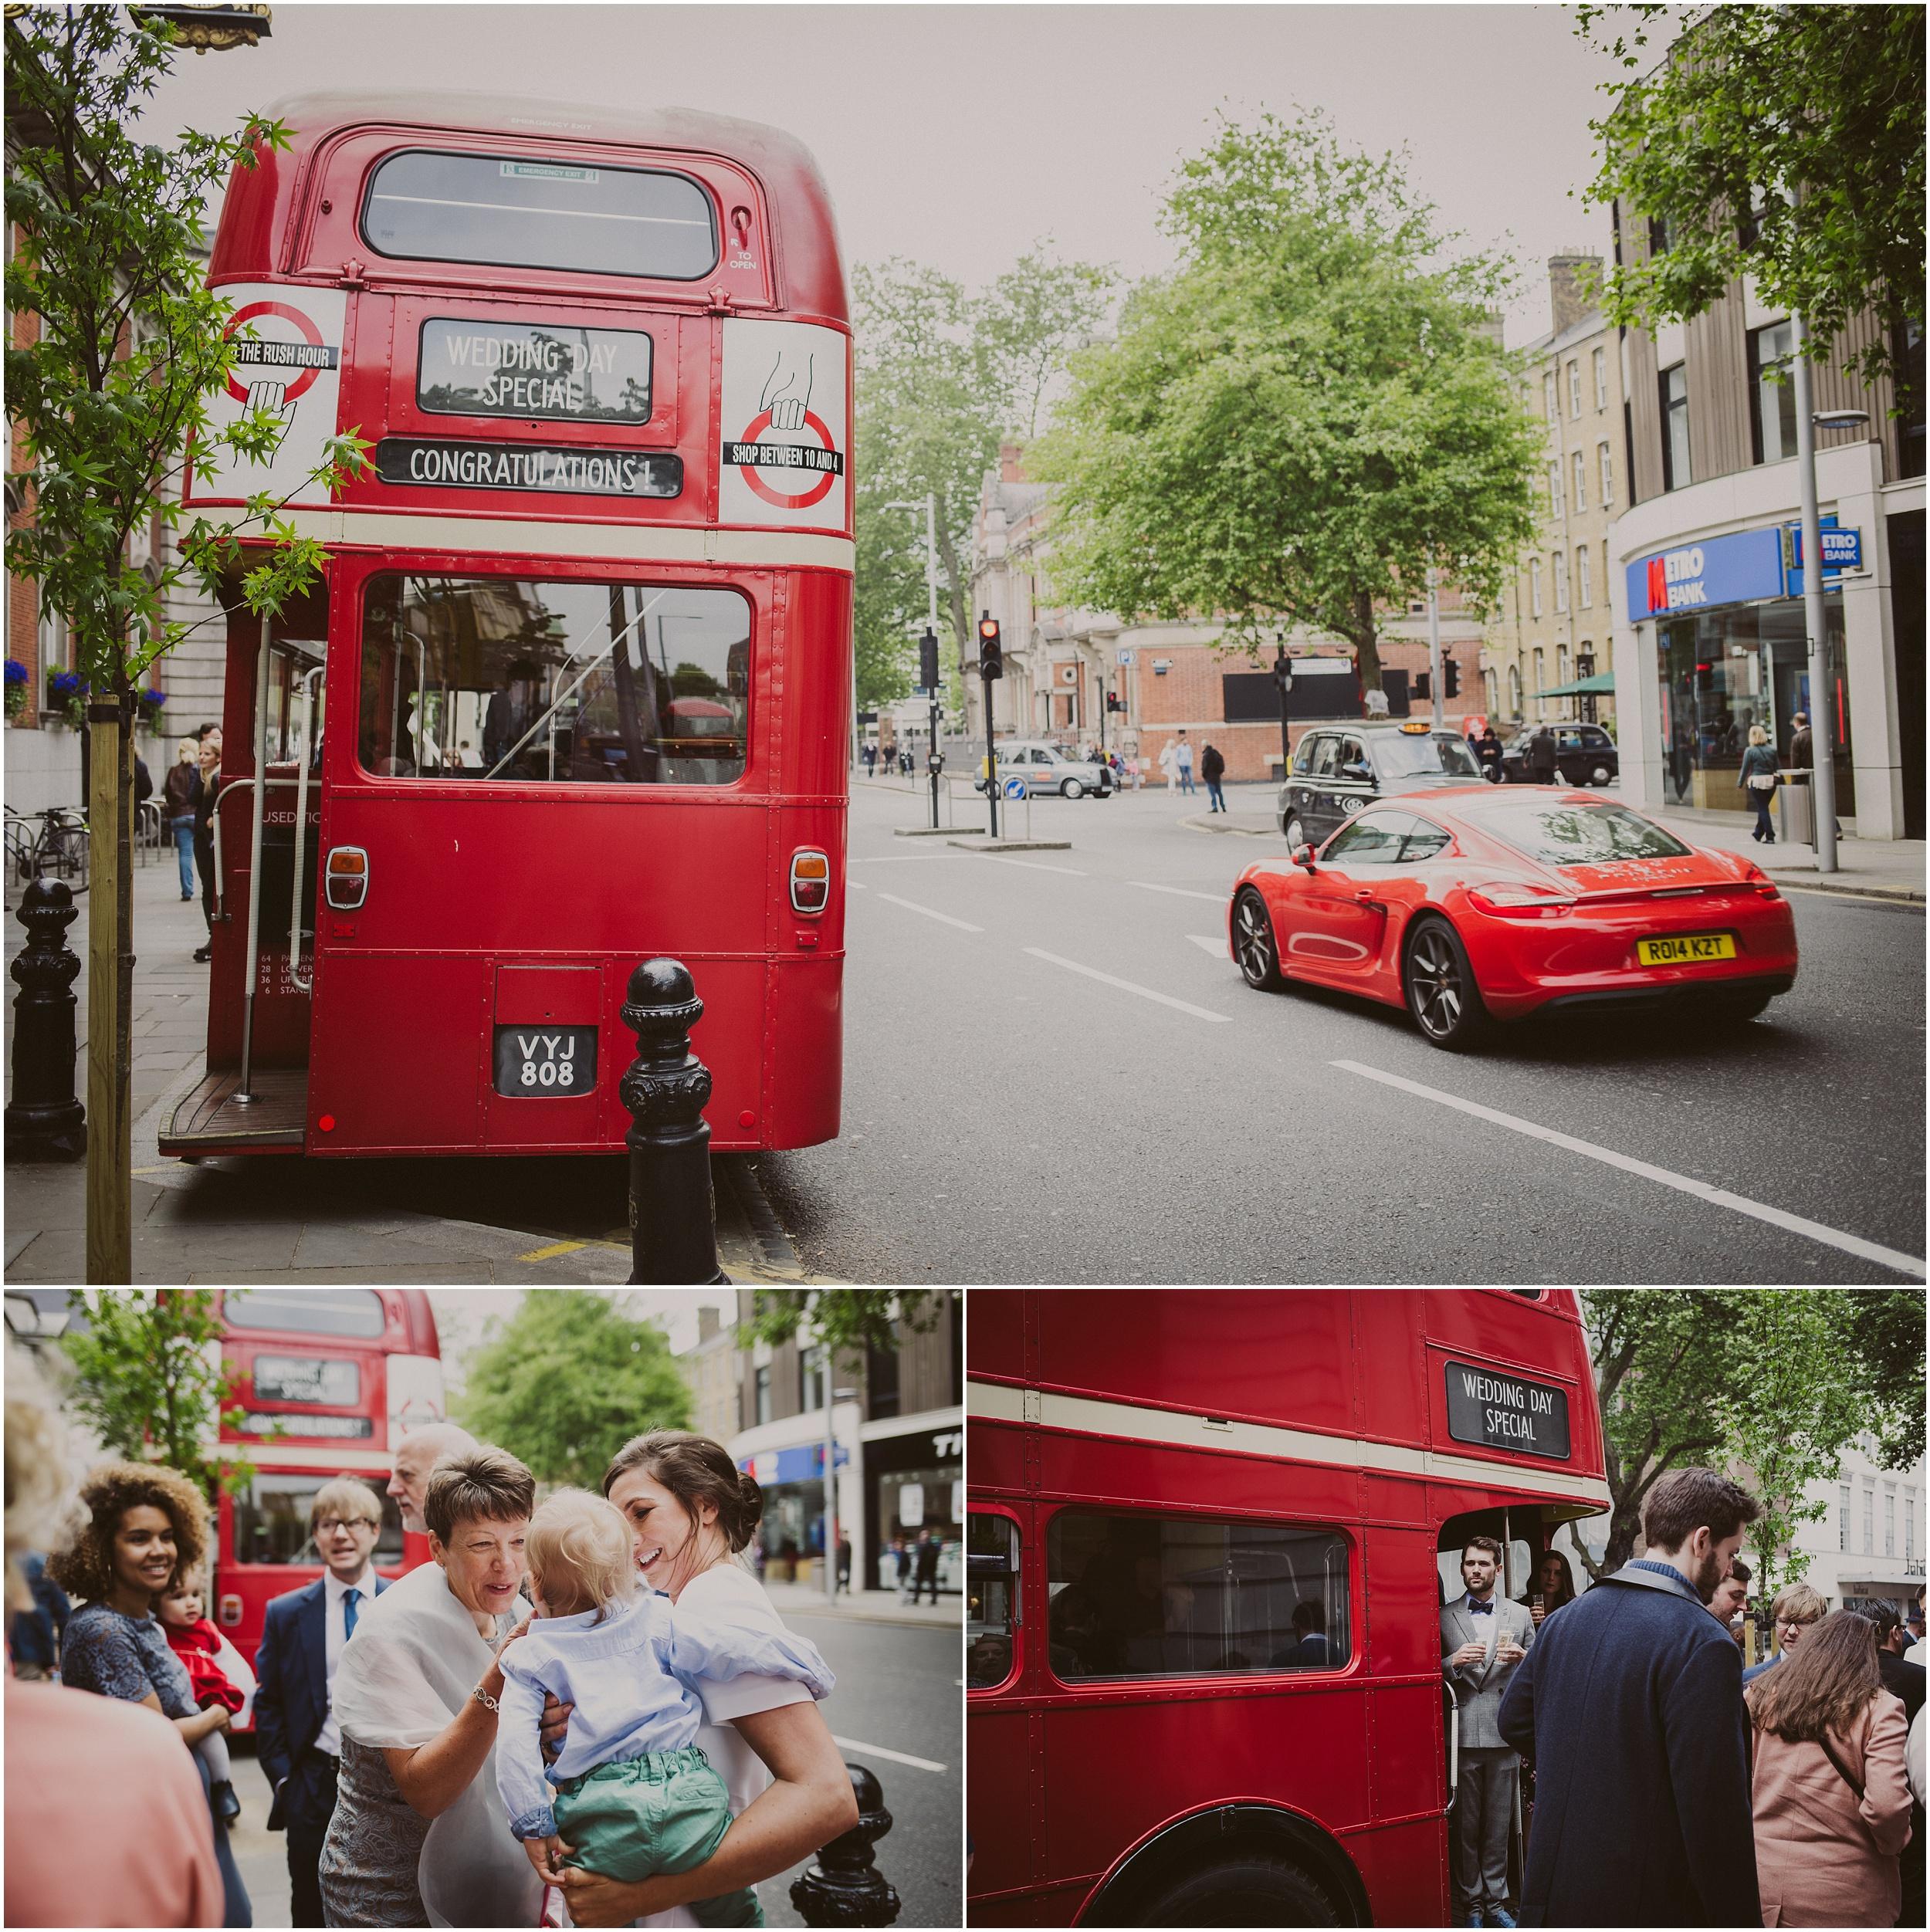 4_170506_Seb&Luise_bus-1.jpg